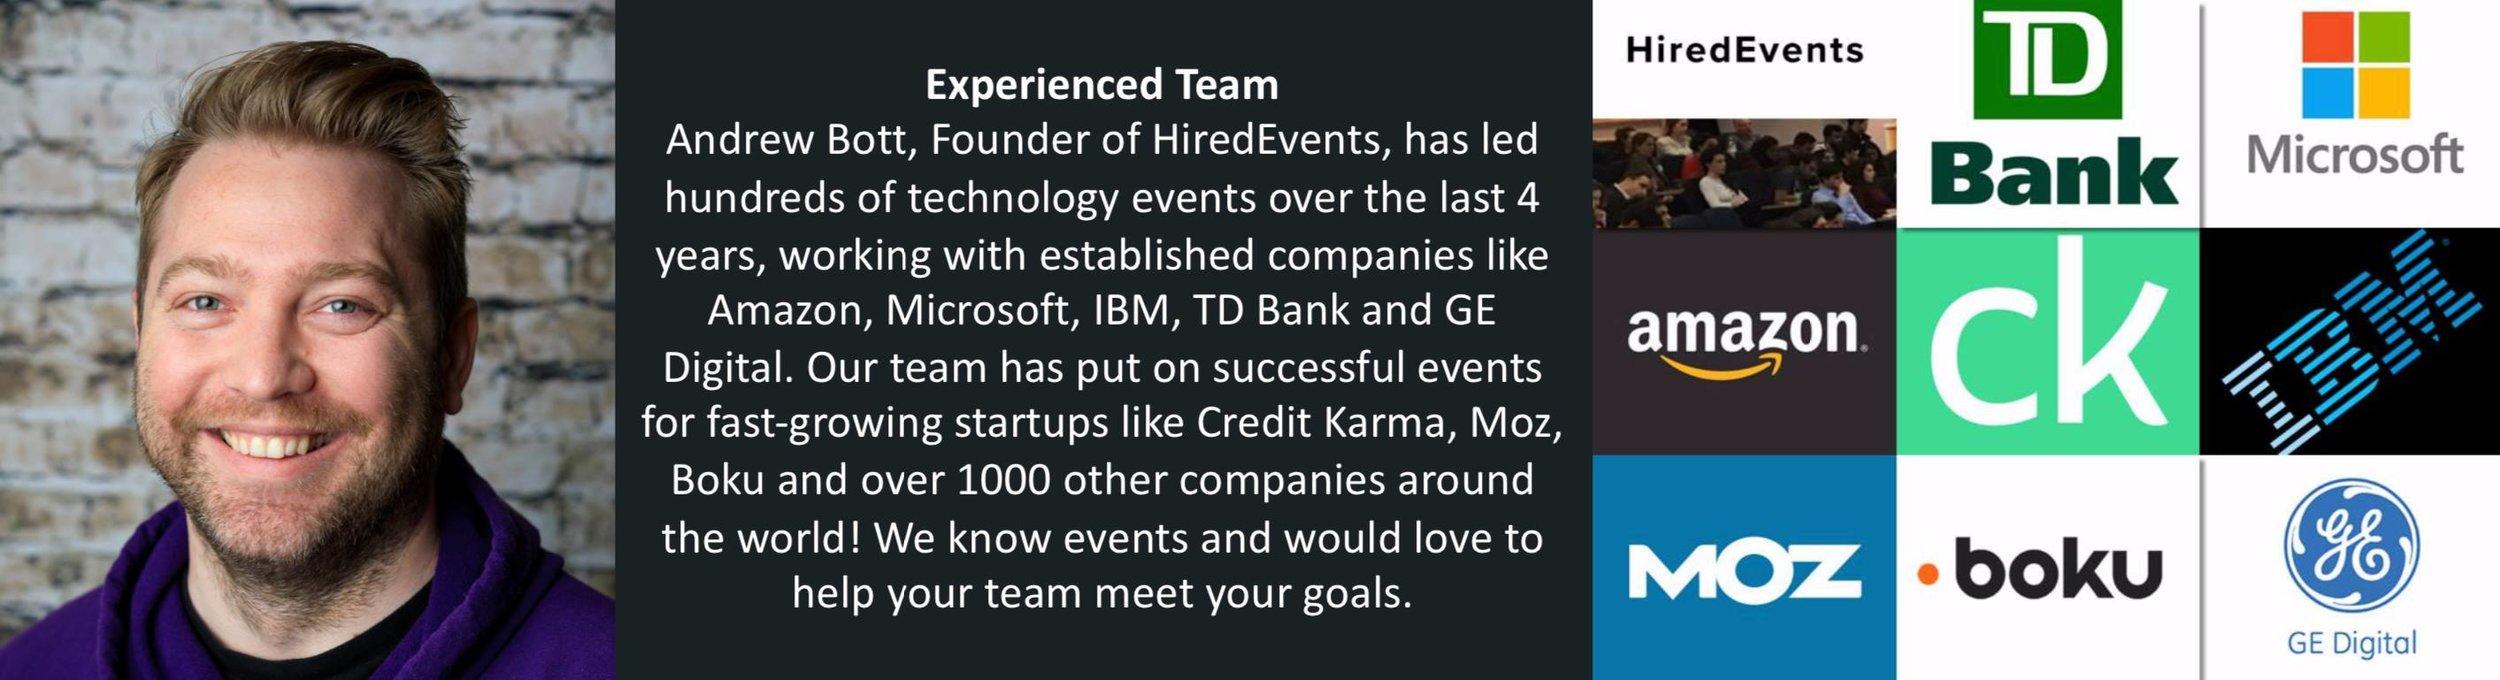 experienced team.jpg